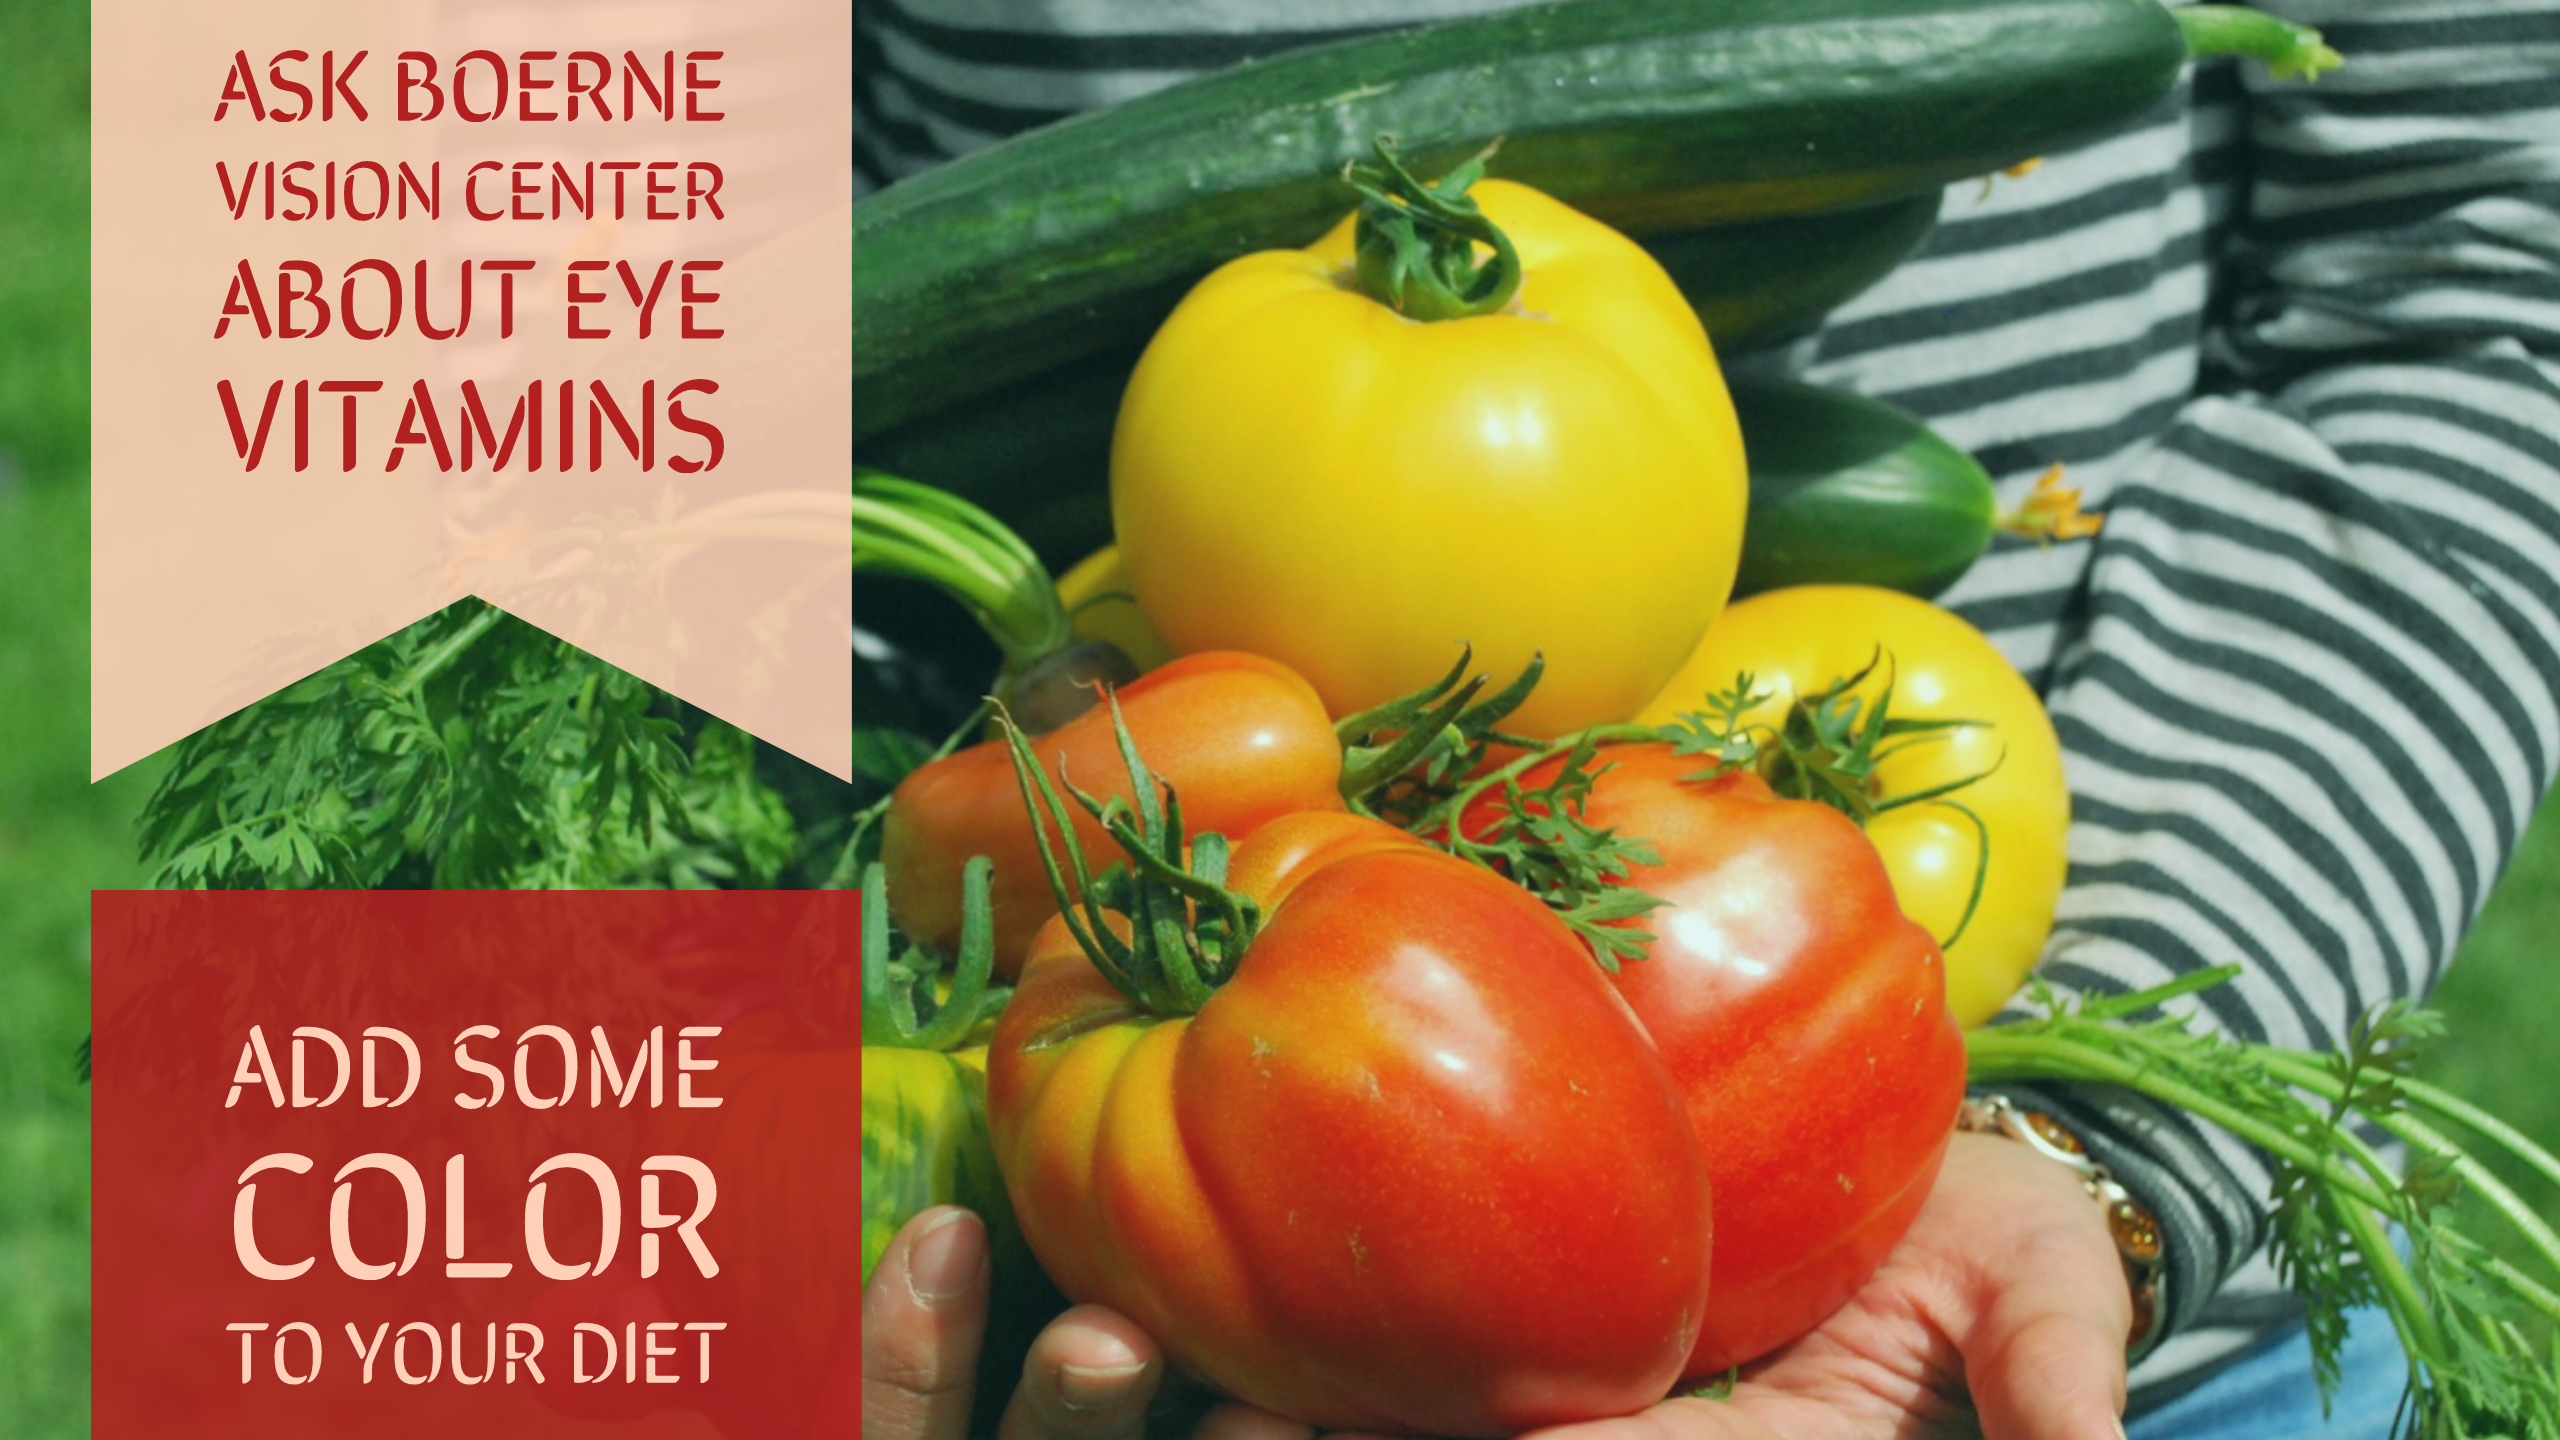 boernevisioncenter eye vitamins